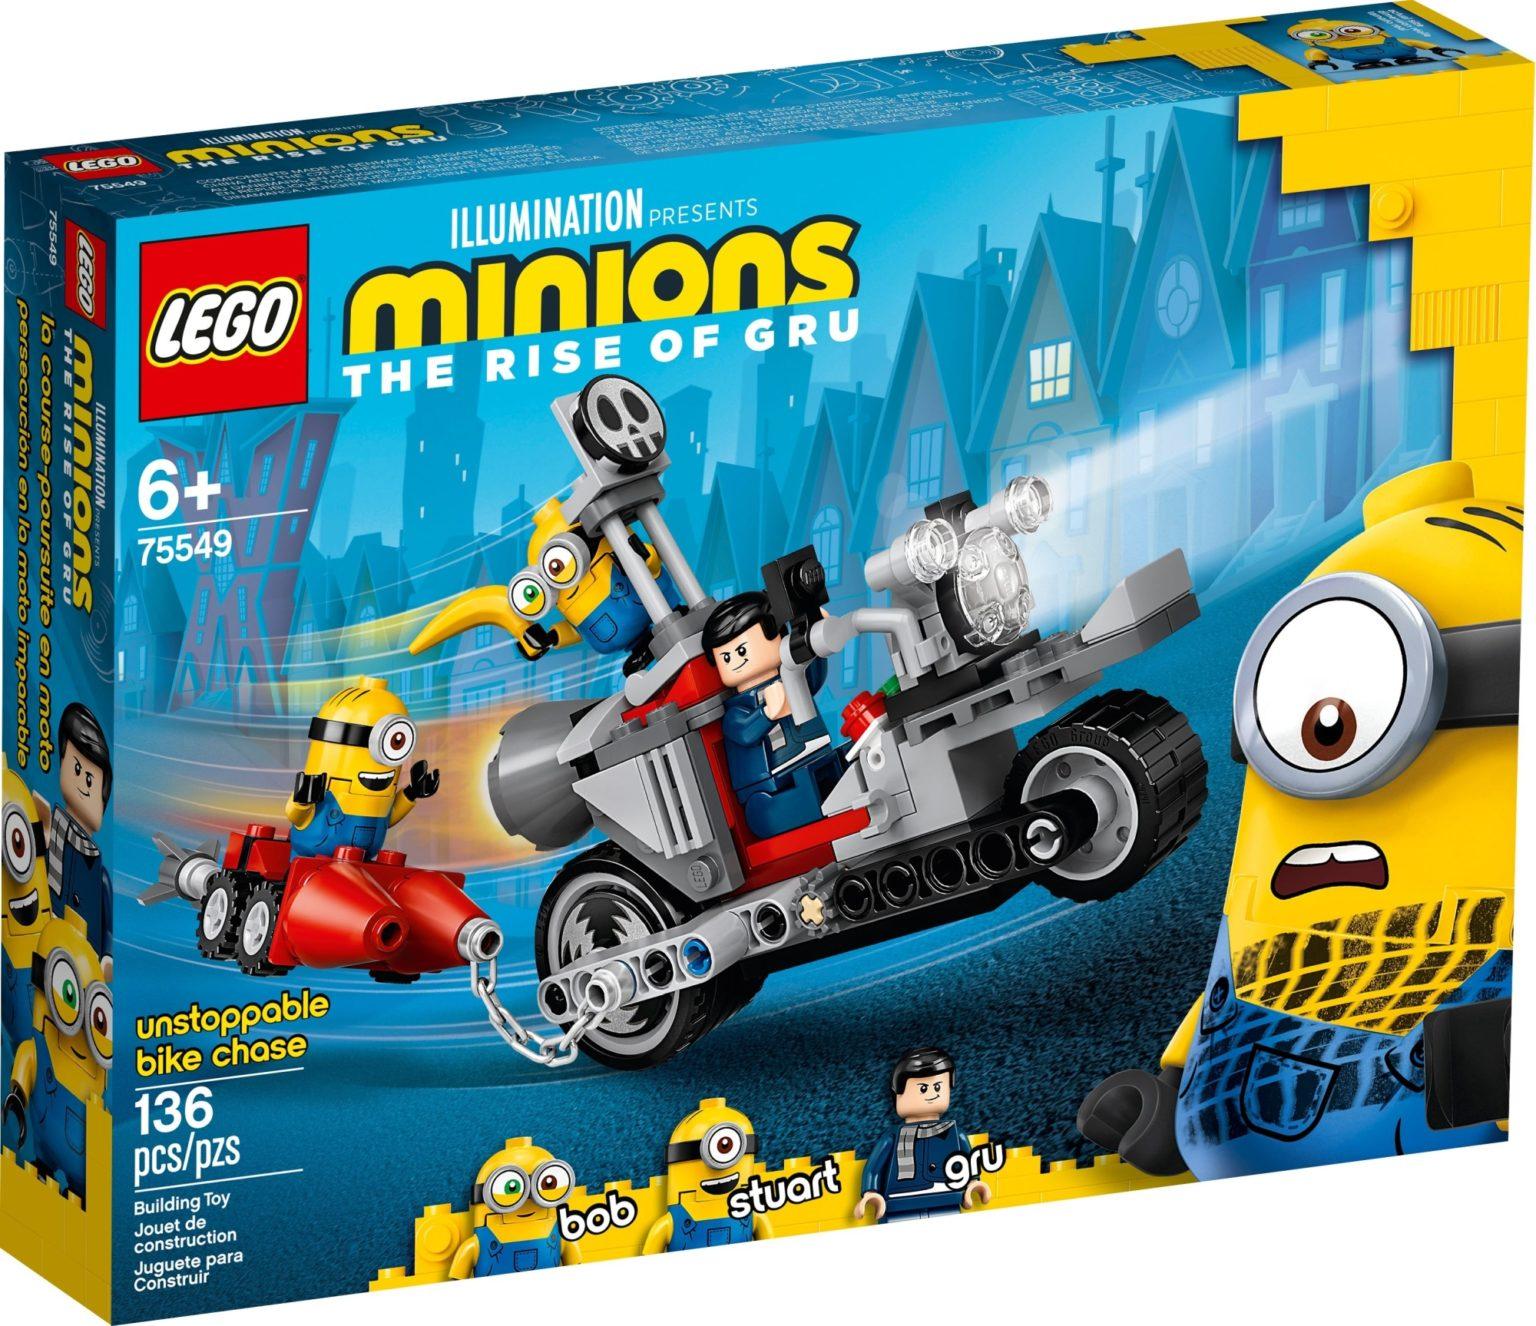 LEGO_75549_alt1